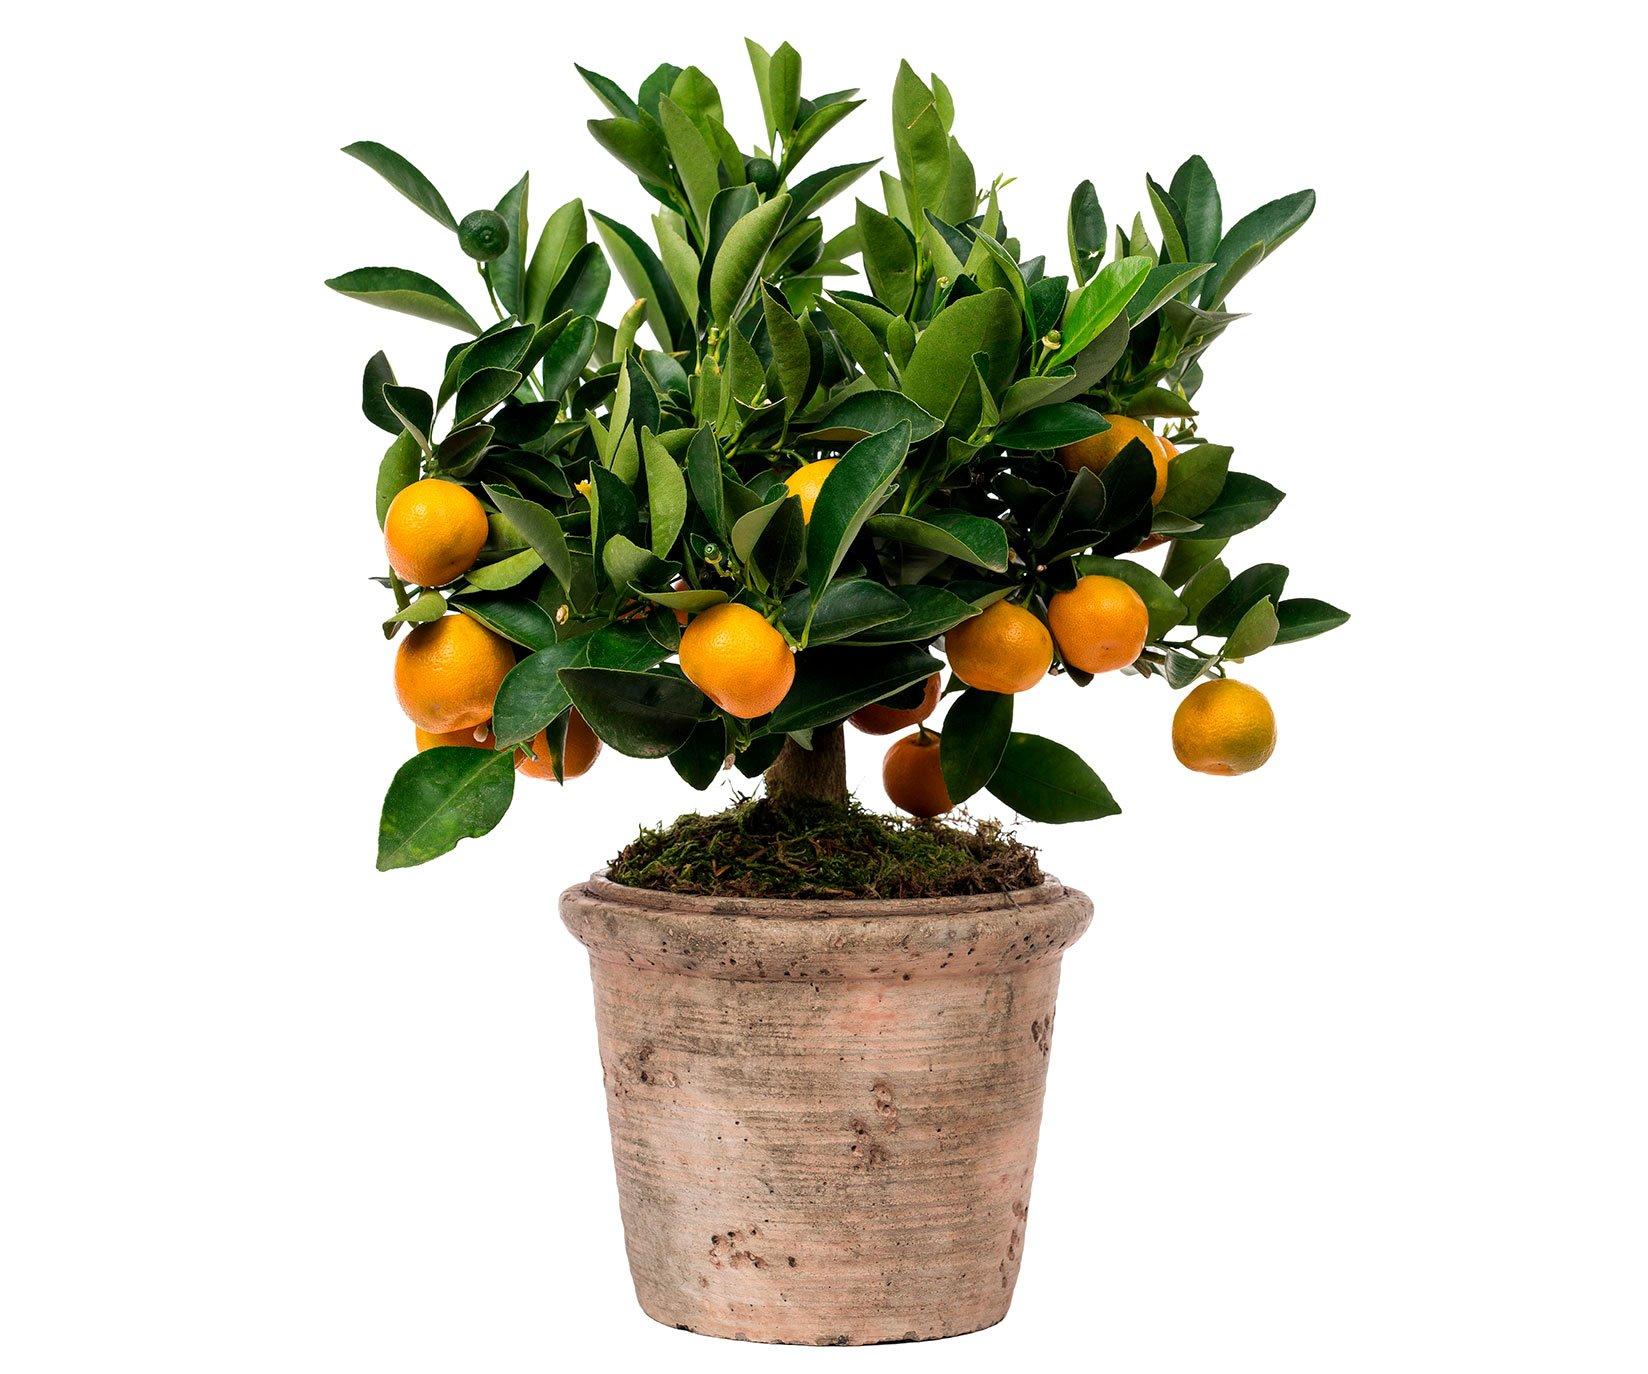 Calamond n en maceta de cer mica margarita se llama mi amor for Plantas en macetas